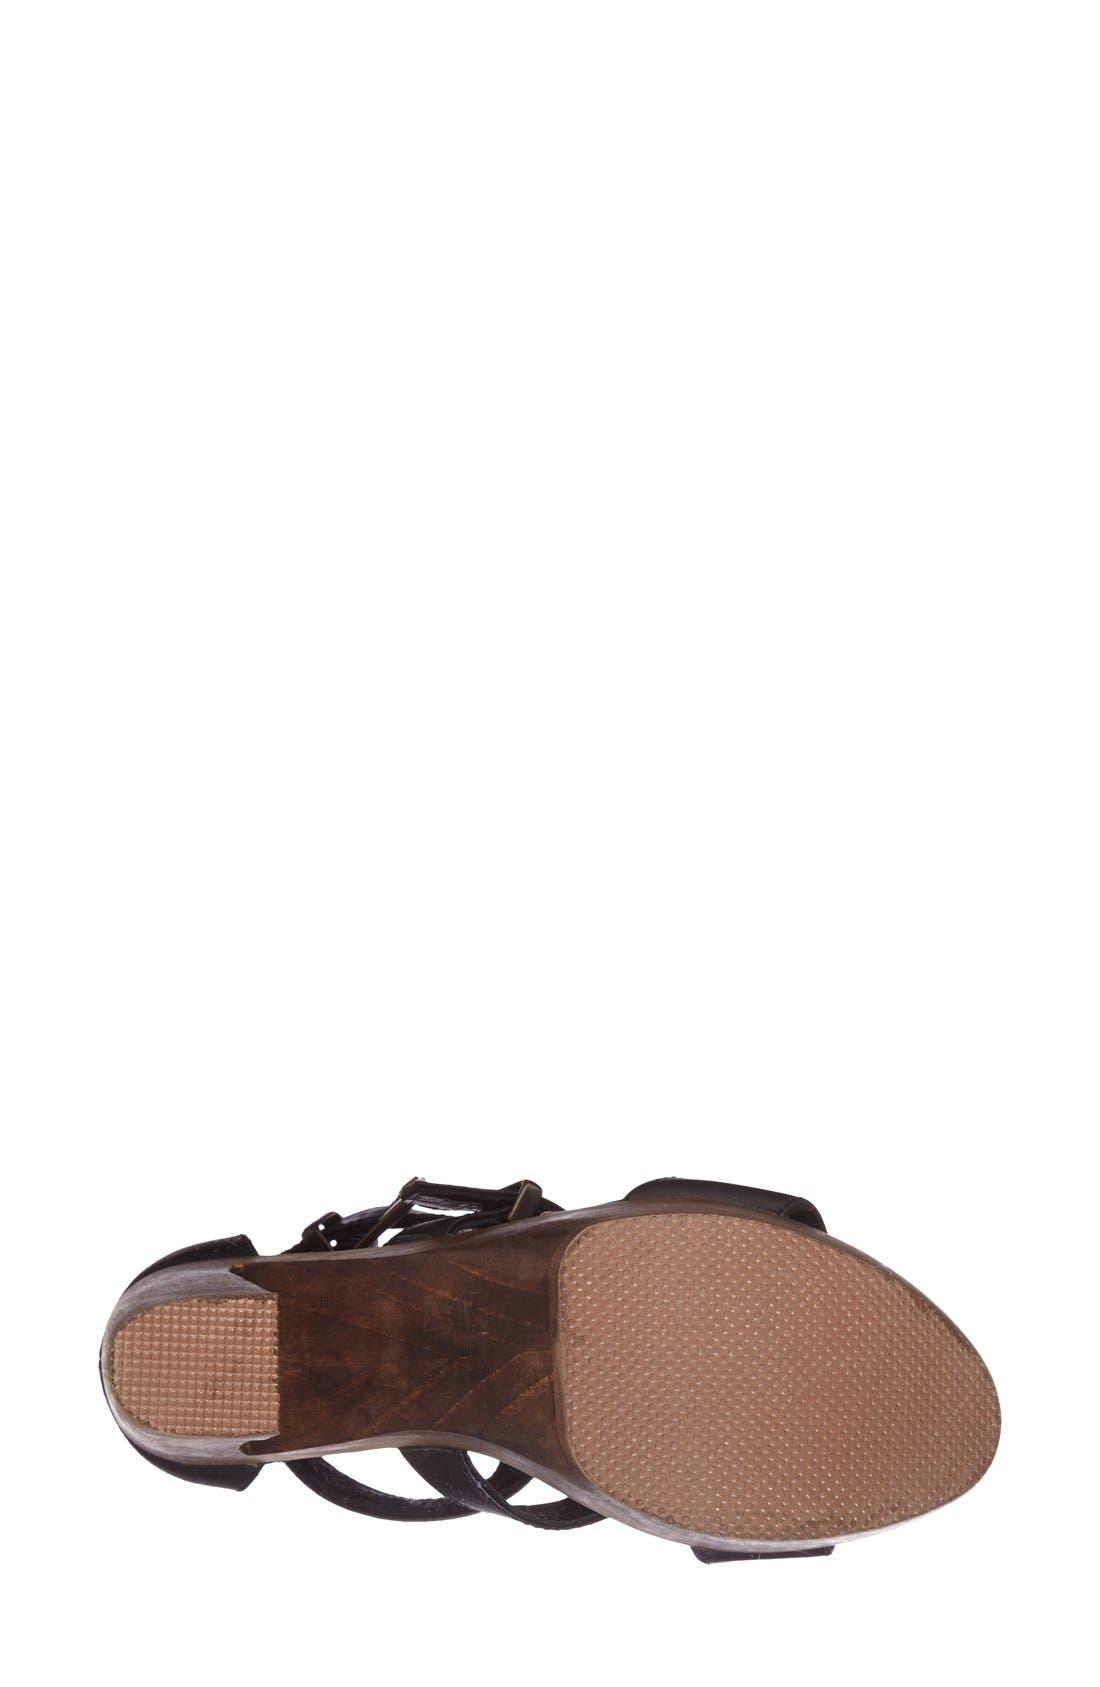 Alternate Image 2  - five worlds by Cordani 'Juarez' Platform Sandal (Women)